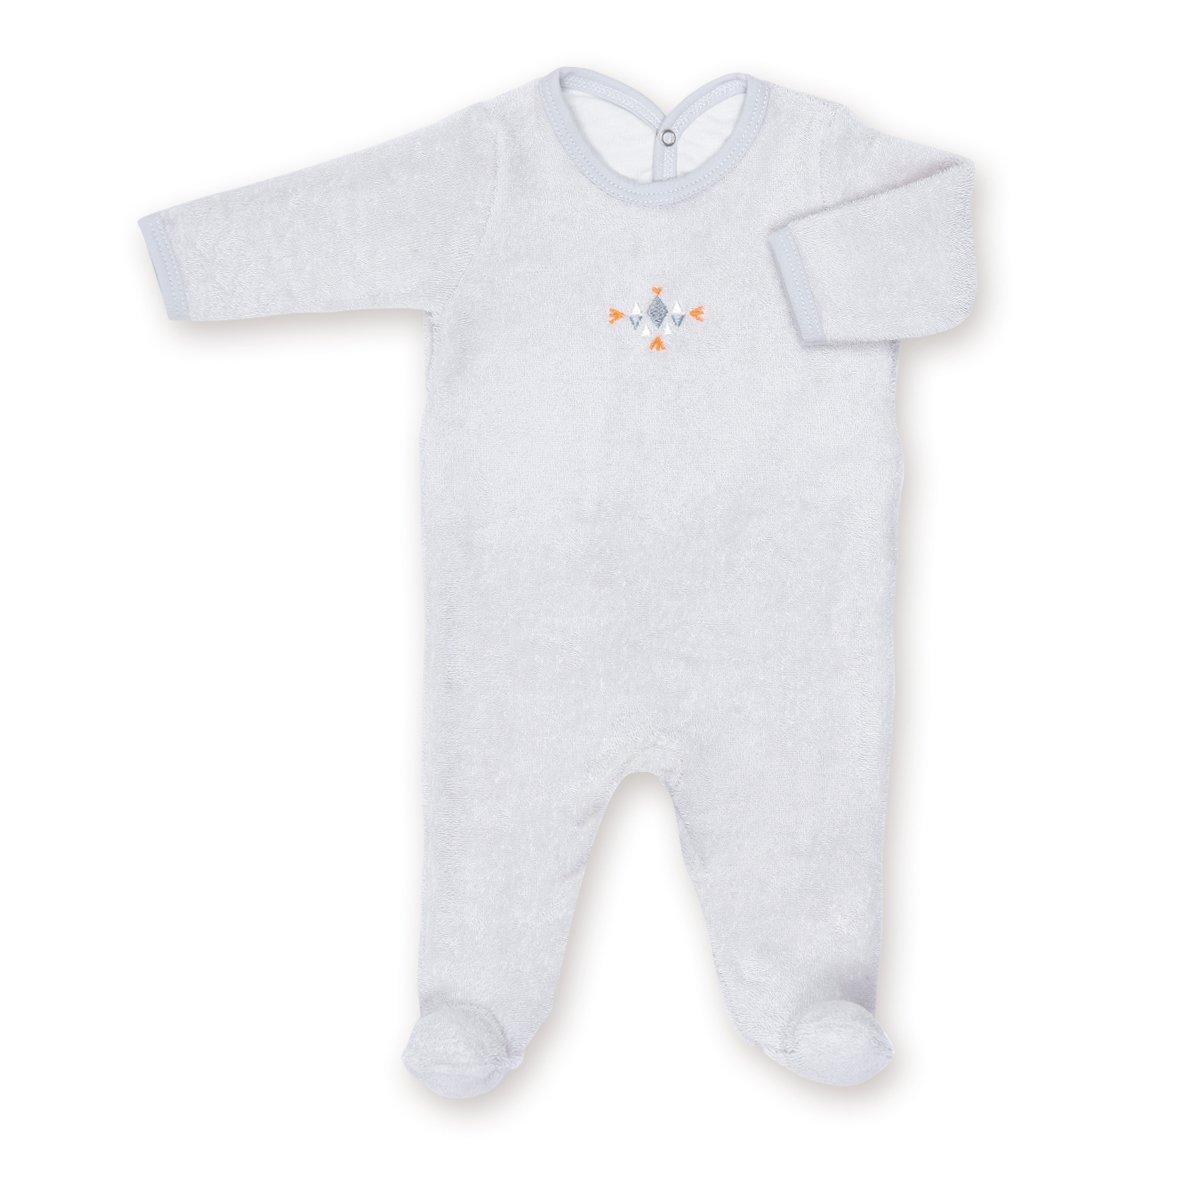 Bemini by Baby Boum Terry Pyjama (3-6 Months, Apawi 90 Plum) 563APAW290TU